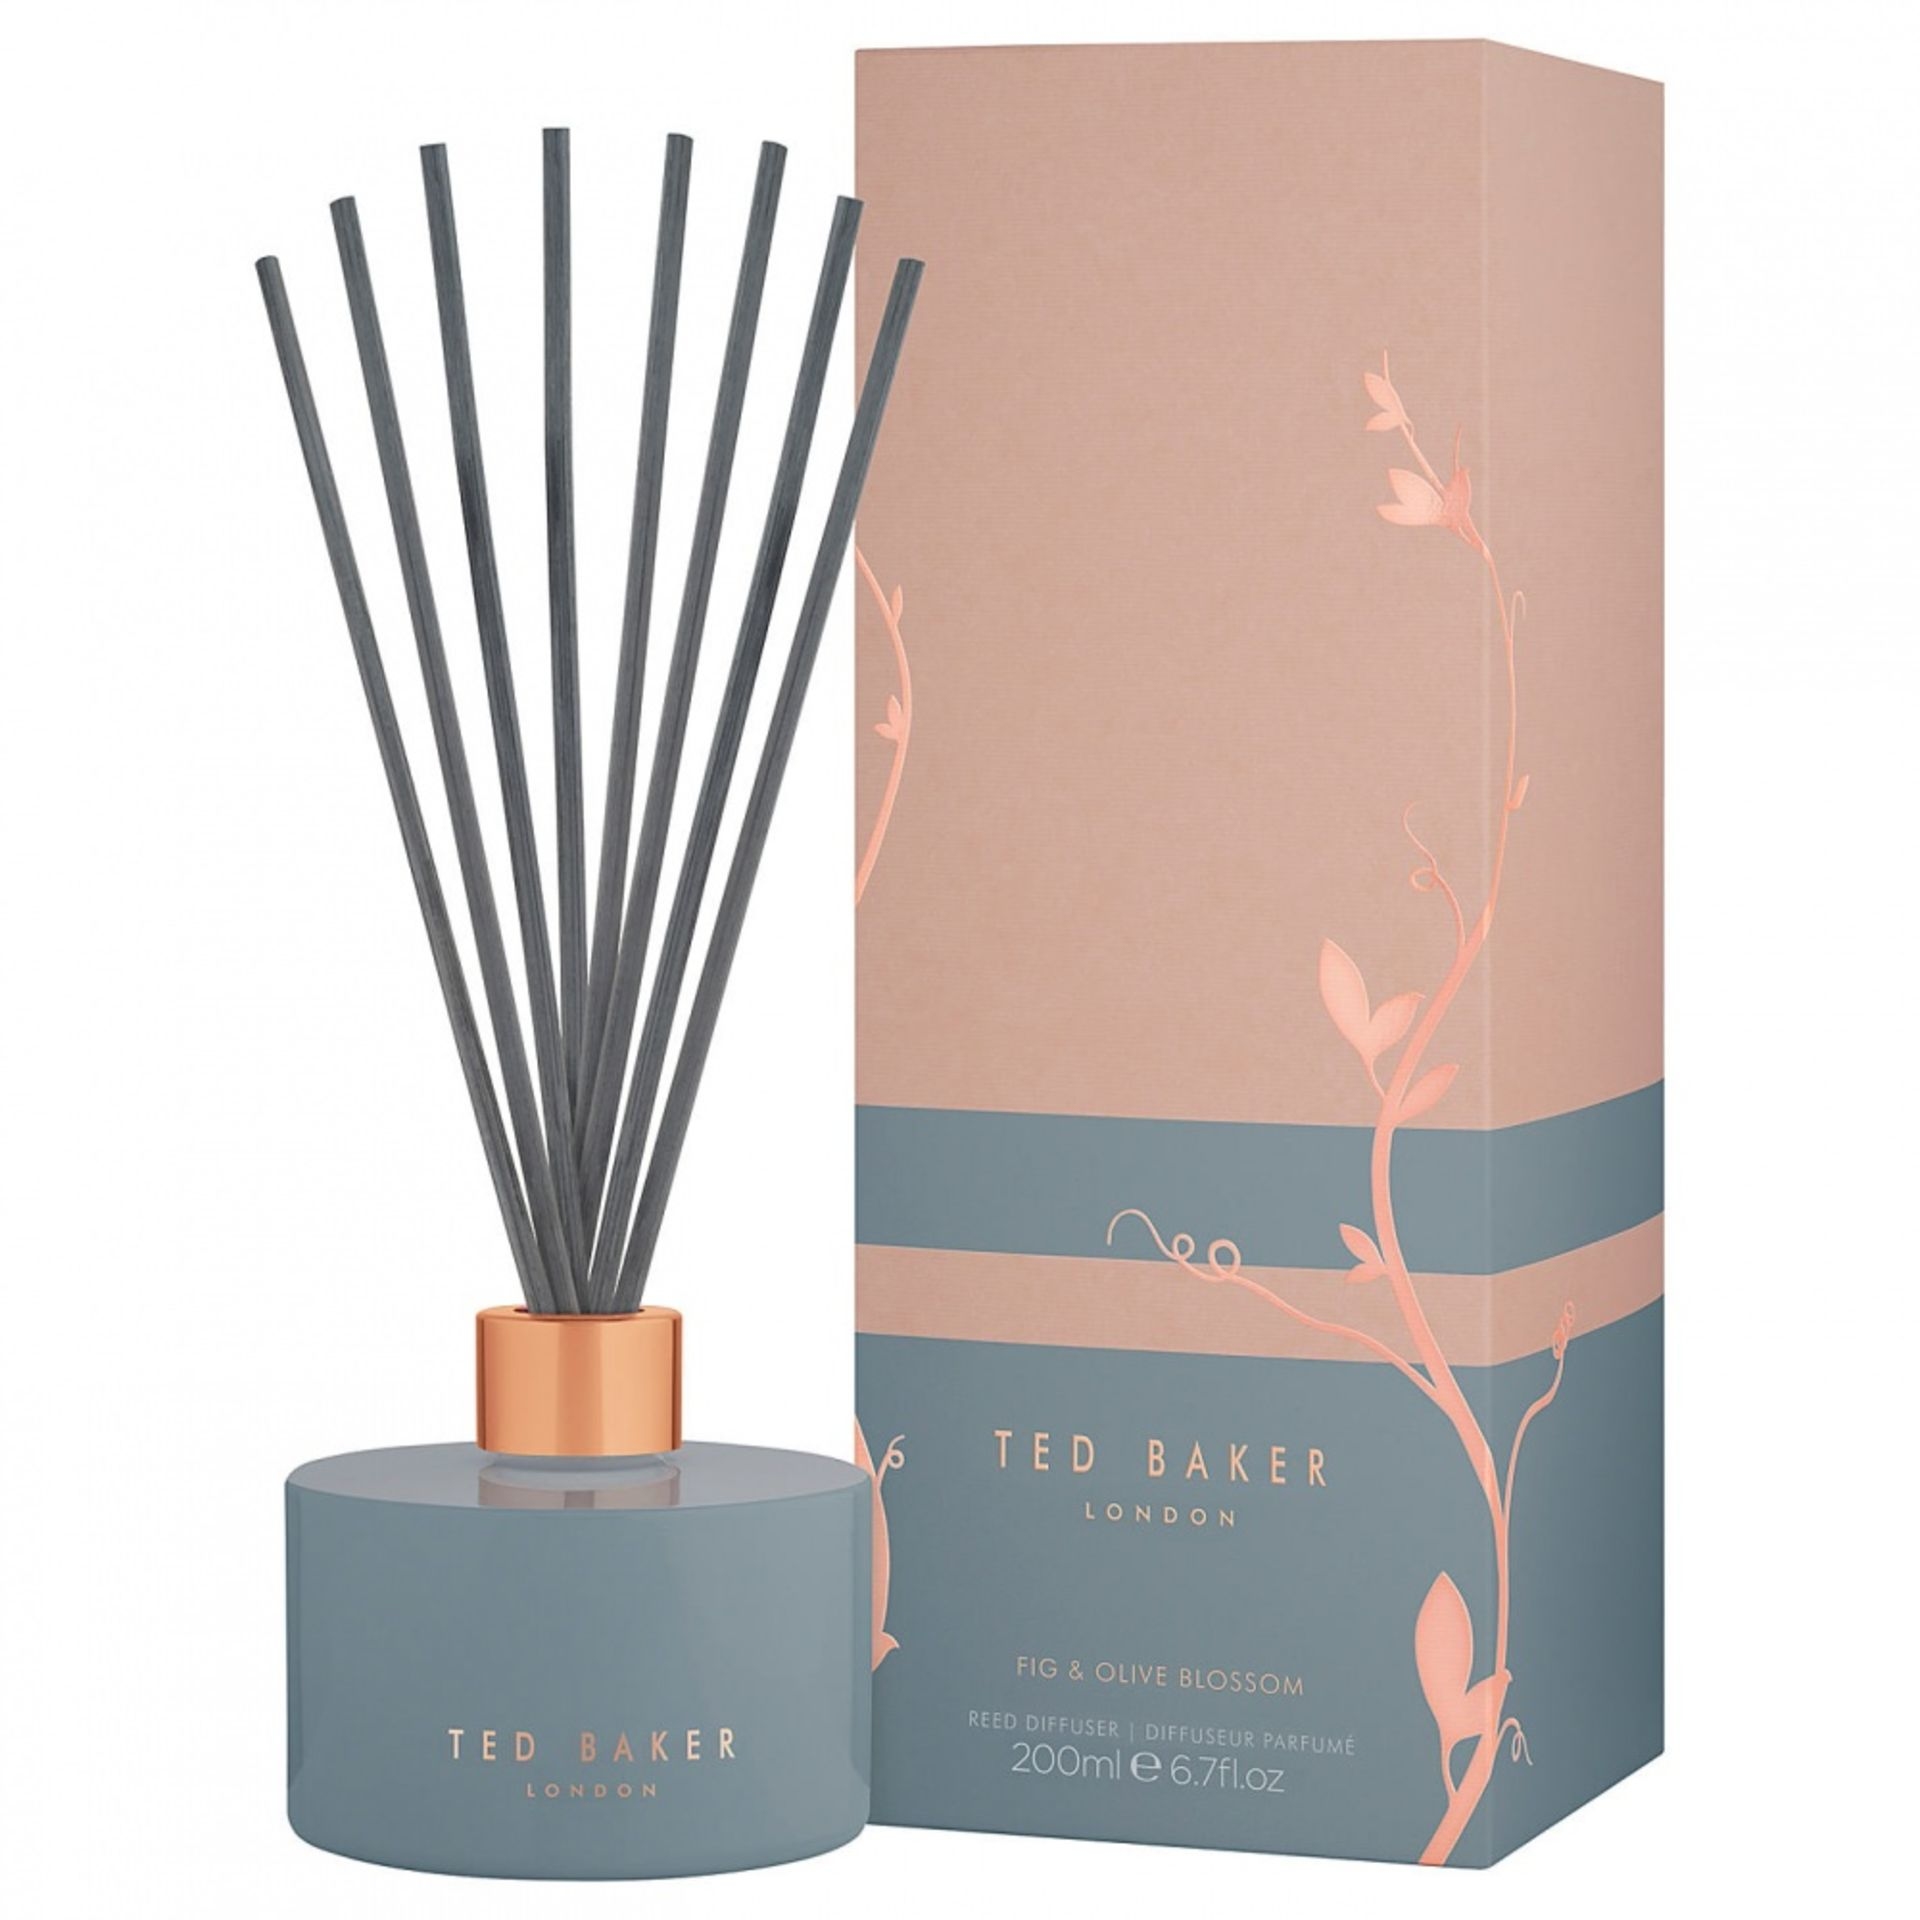 Lot 50097 - V Brand New Ted Baker Fig & Olive Blossom Reed Diffuser - ISP £34 (John Lewis)